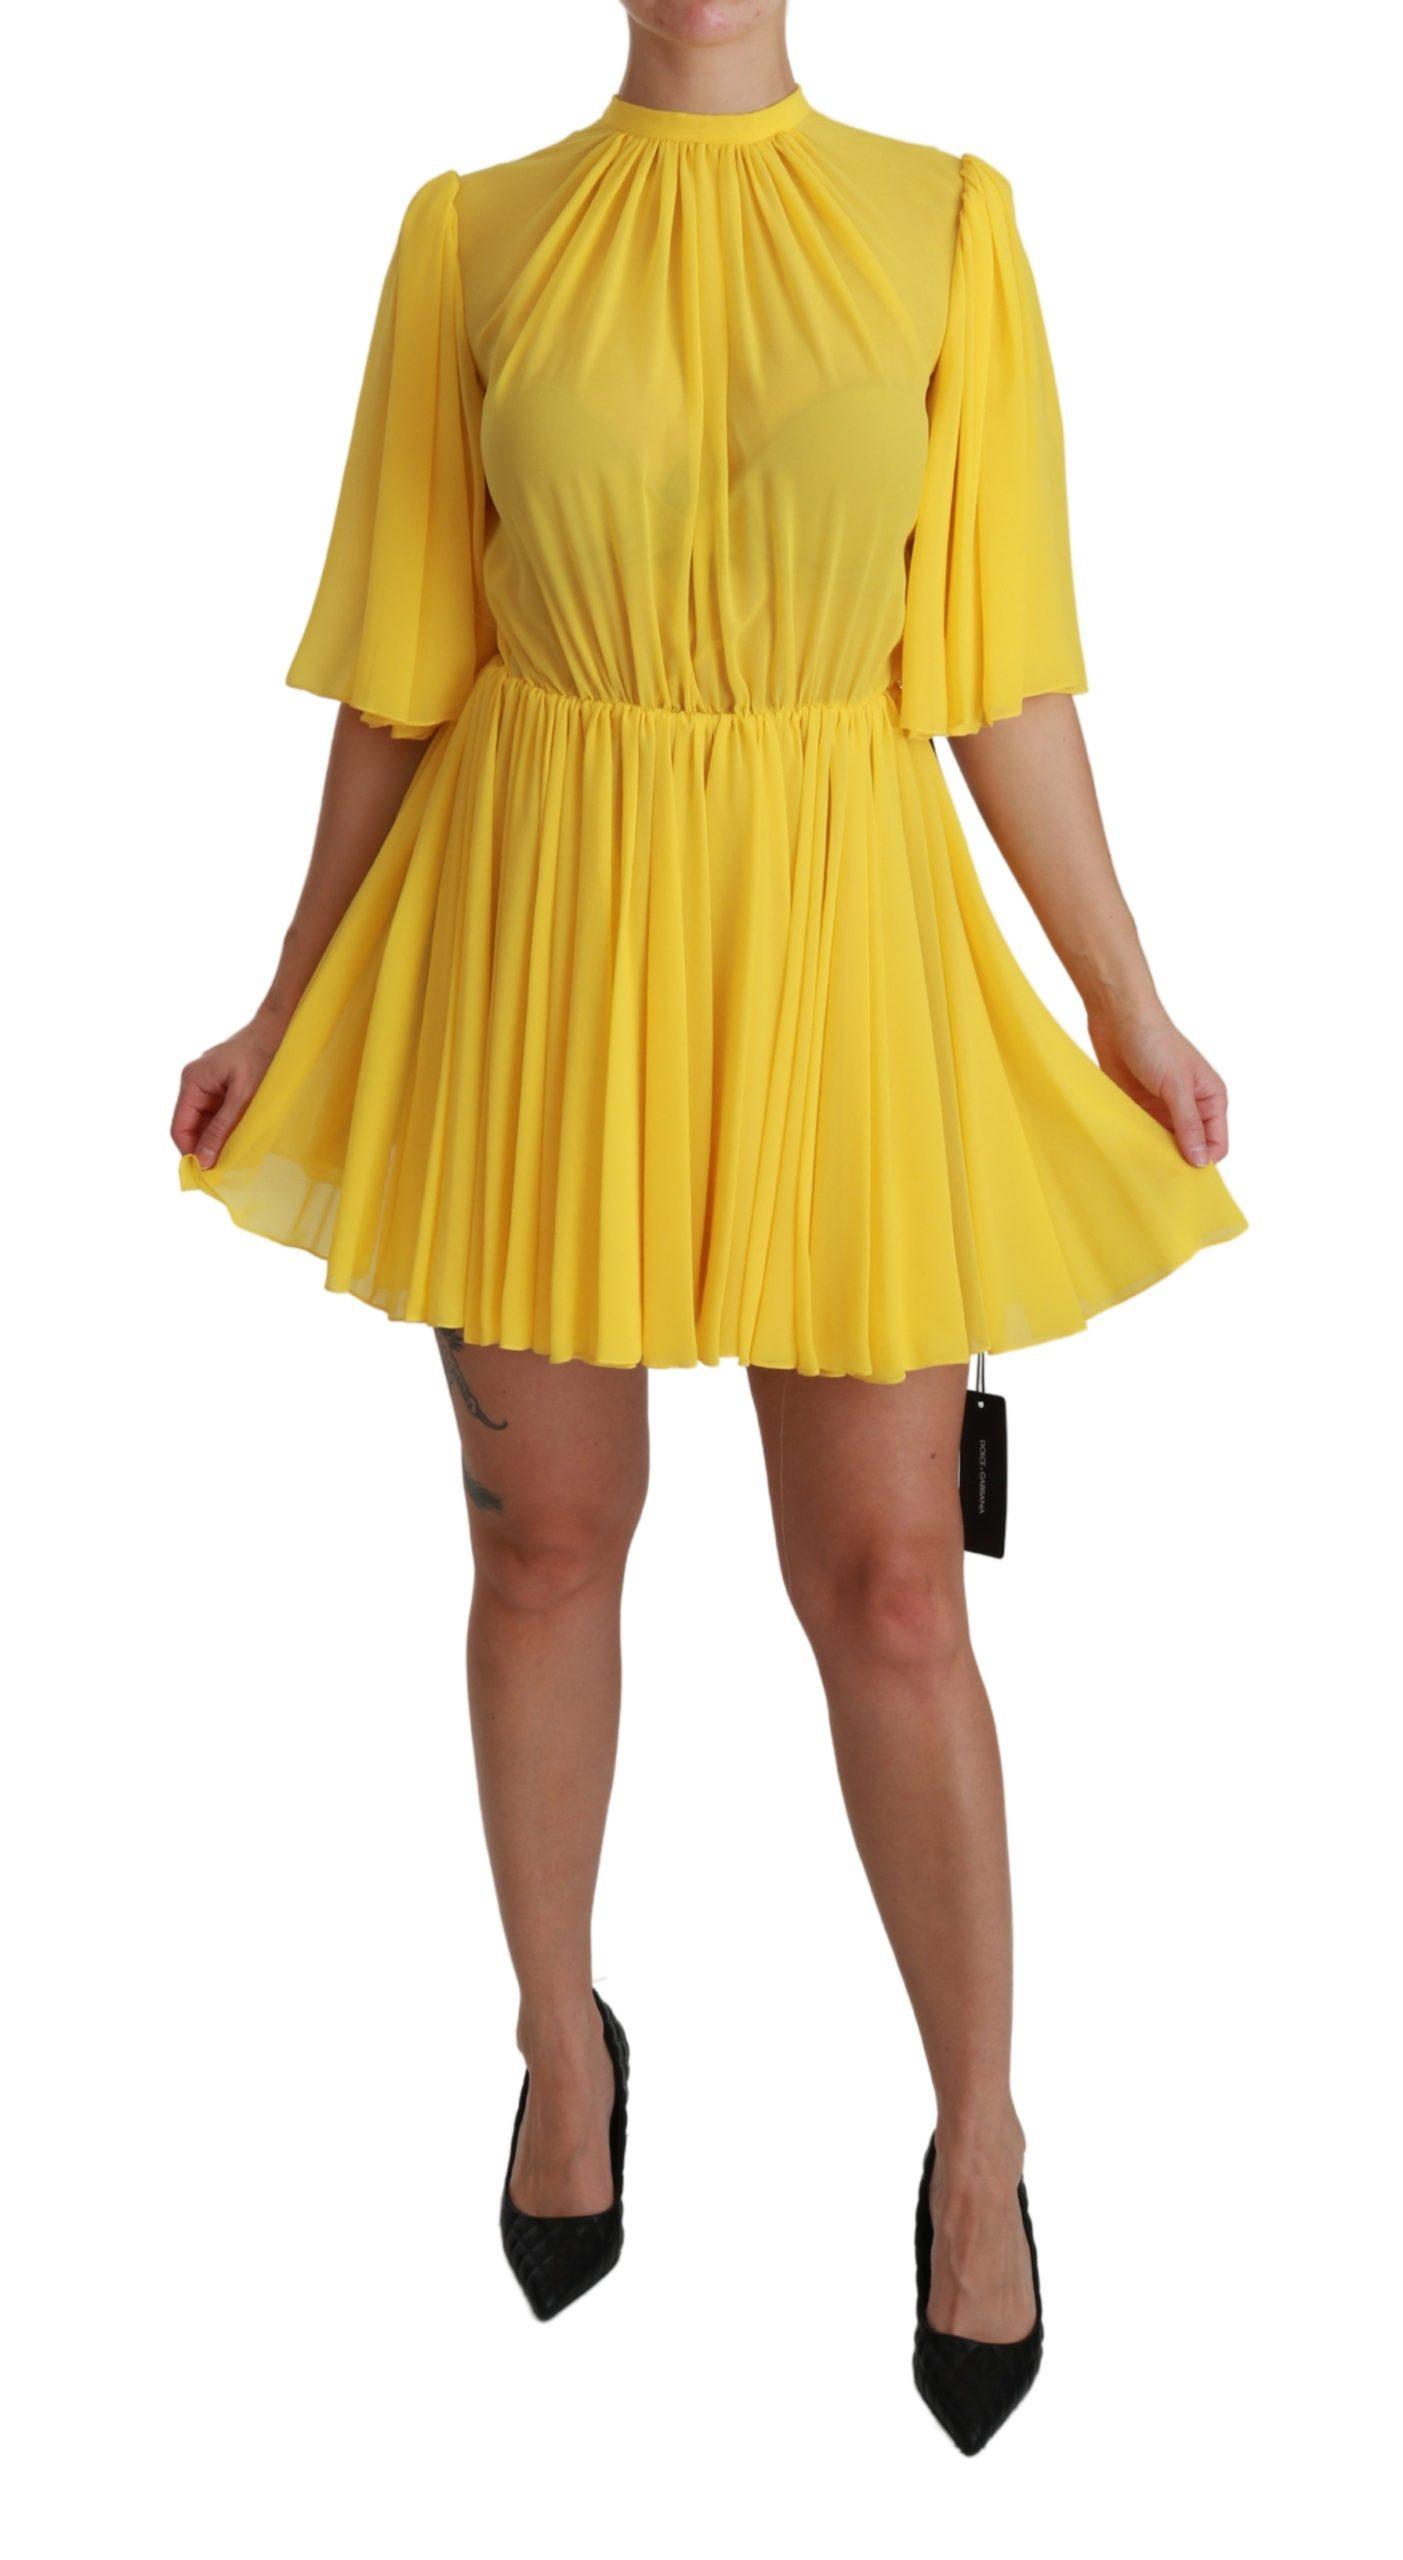 Dolce & Gabbana Women's Pleated A-line Silk Dress Yellow DR2516 - IT40|S